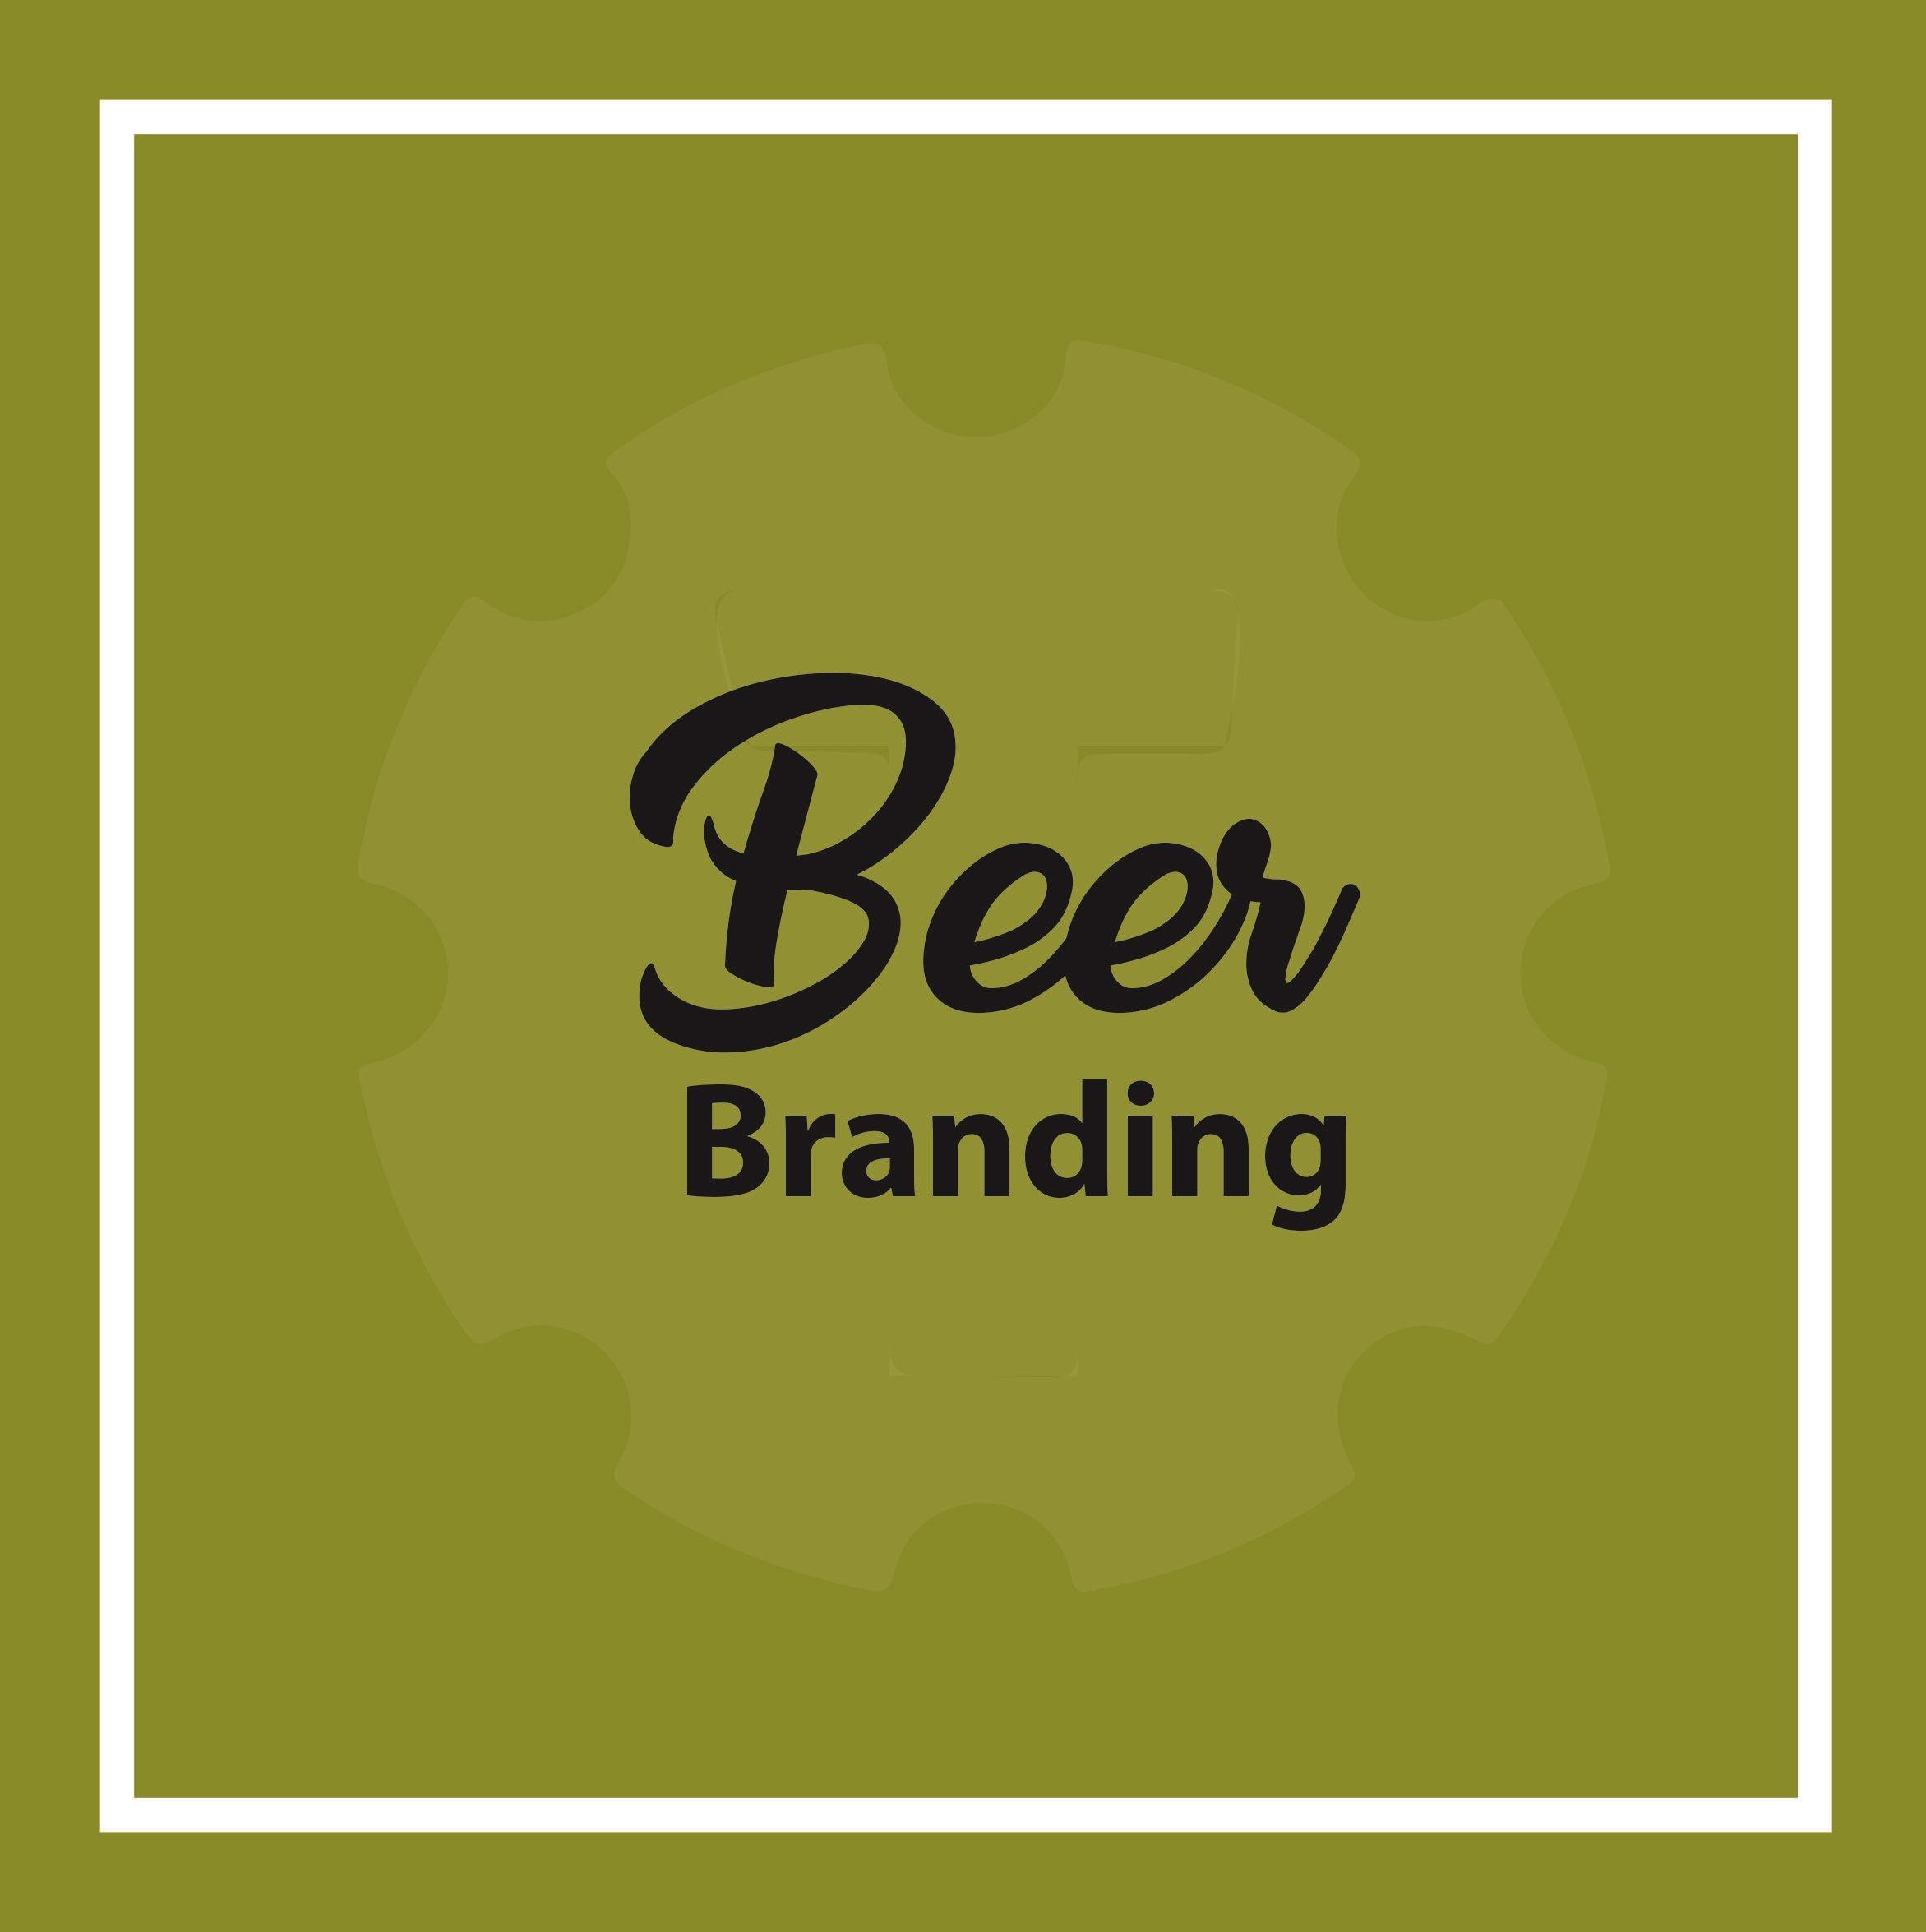 86 Best Beer Branding images | Beer, Beer brands, Brewery